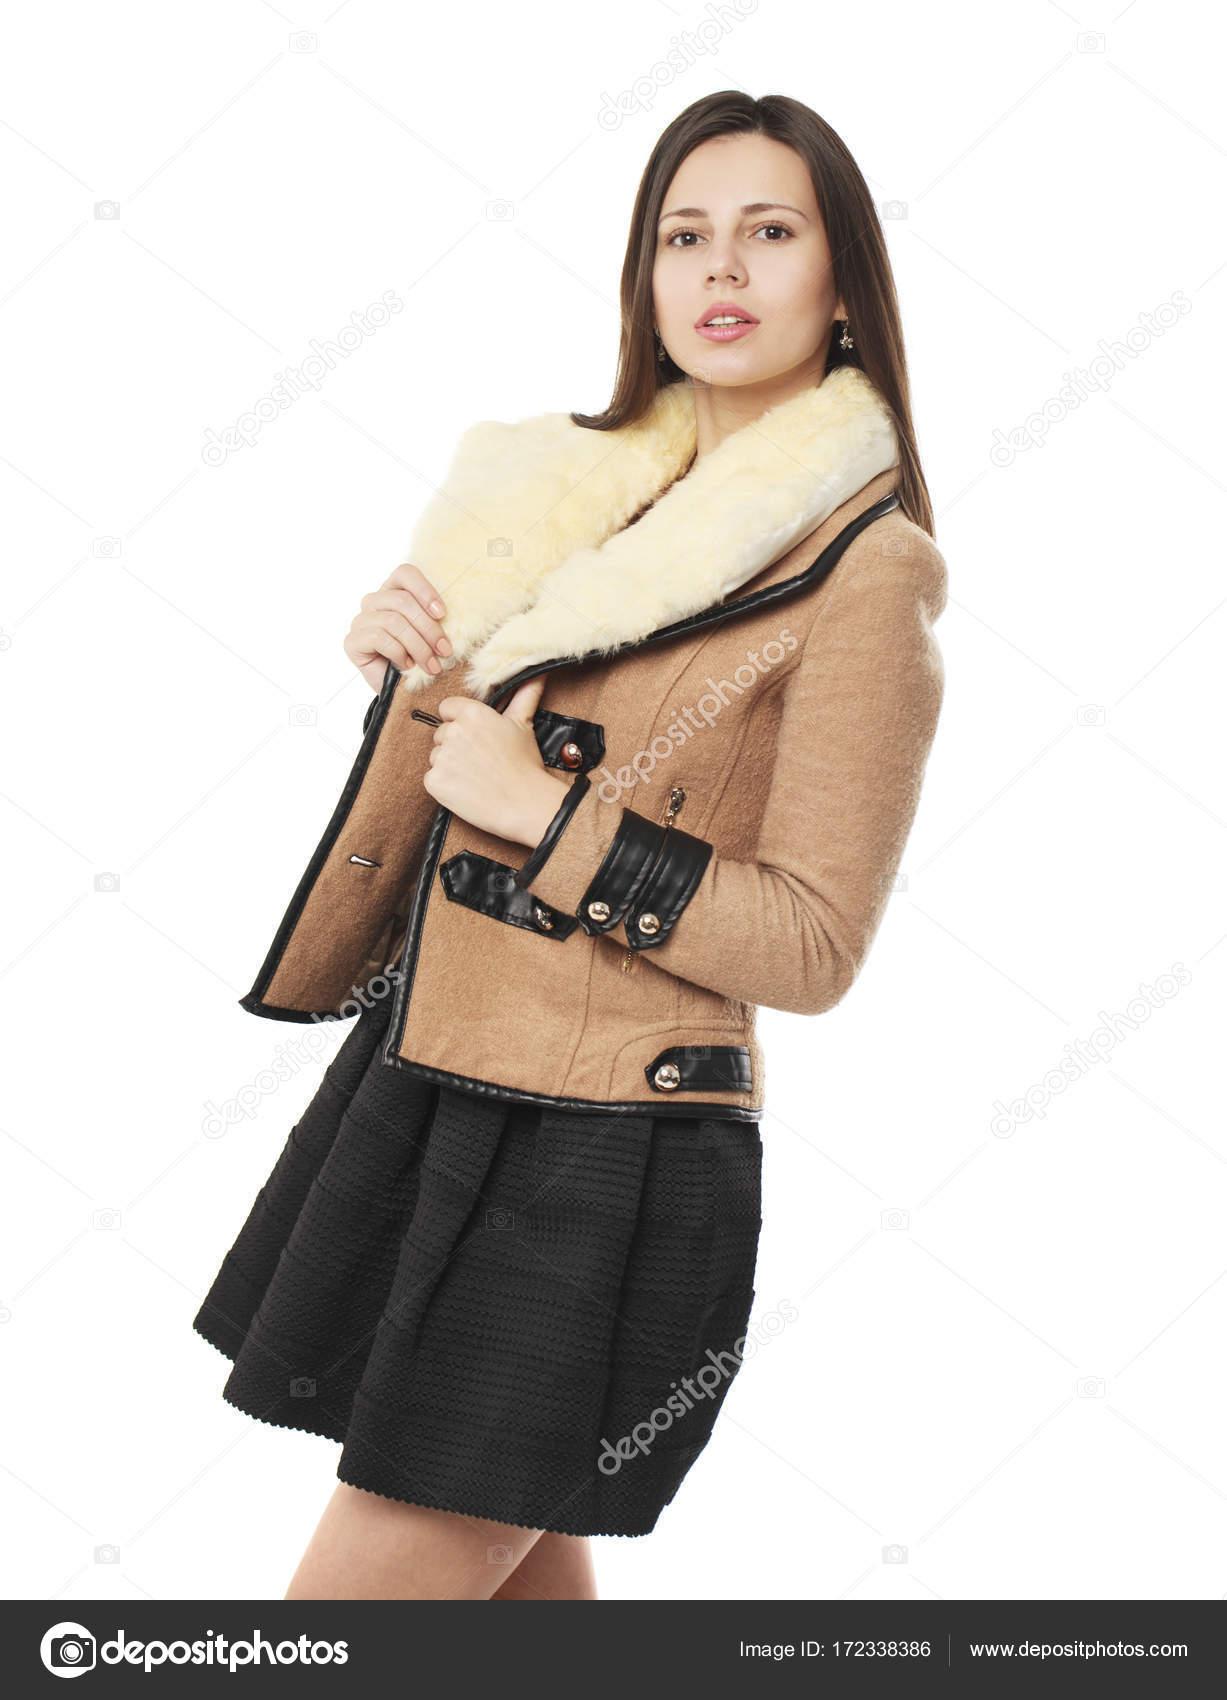 d6e4b32f62e5 Νεαρή γυναίκα σε κομψά σε μπεζ μπουφάν — Φωτογραφία Αρχείου ...